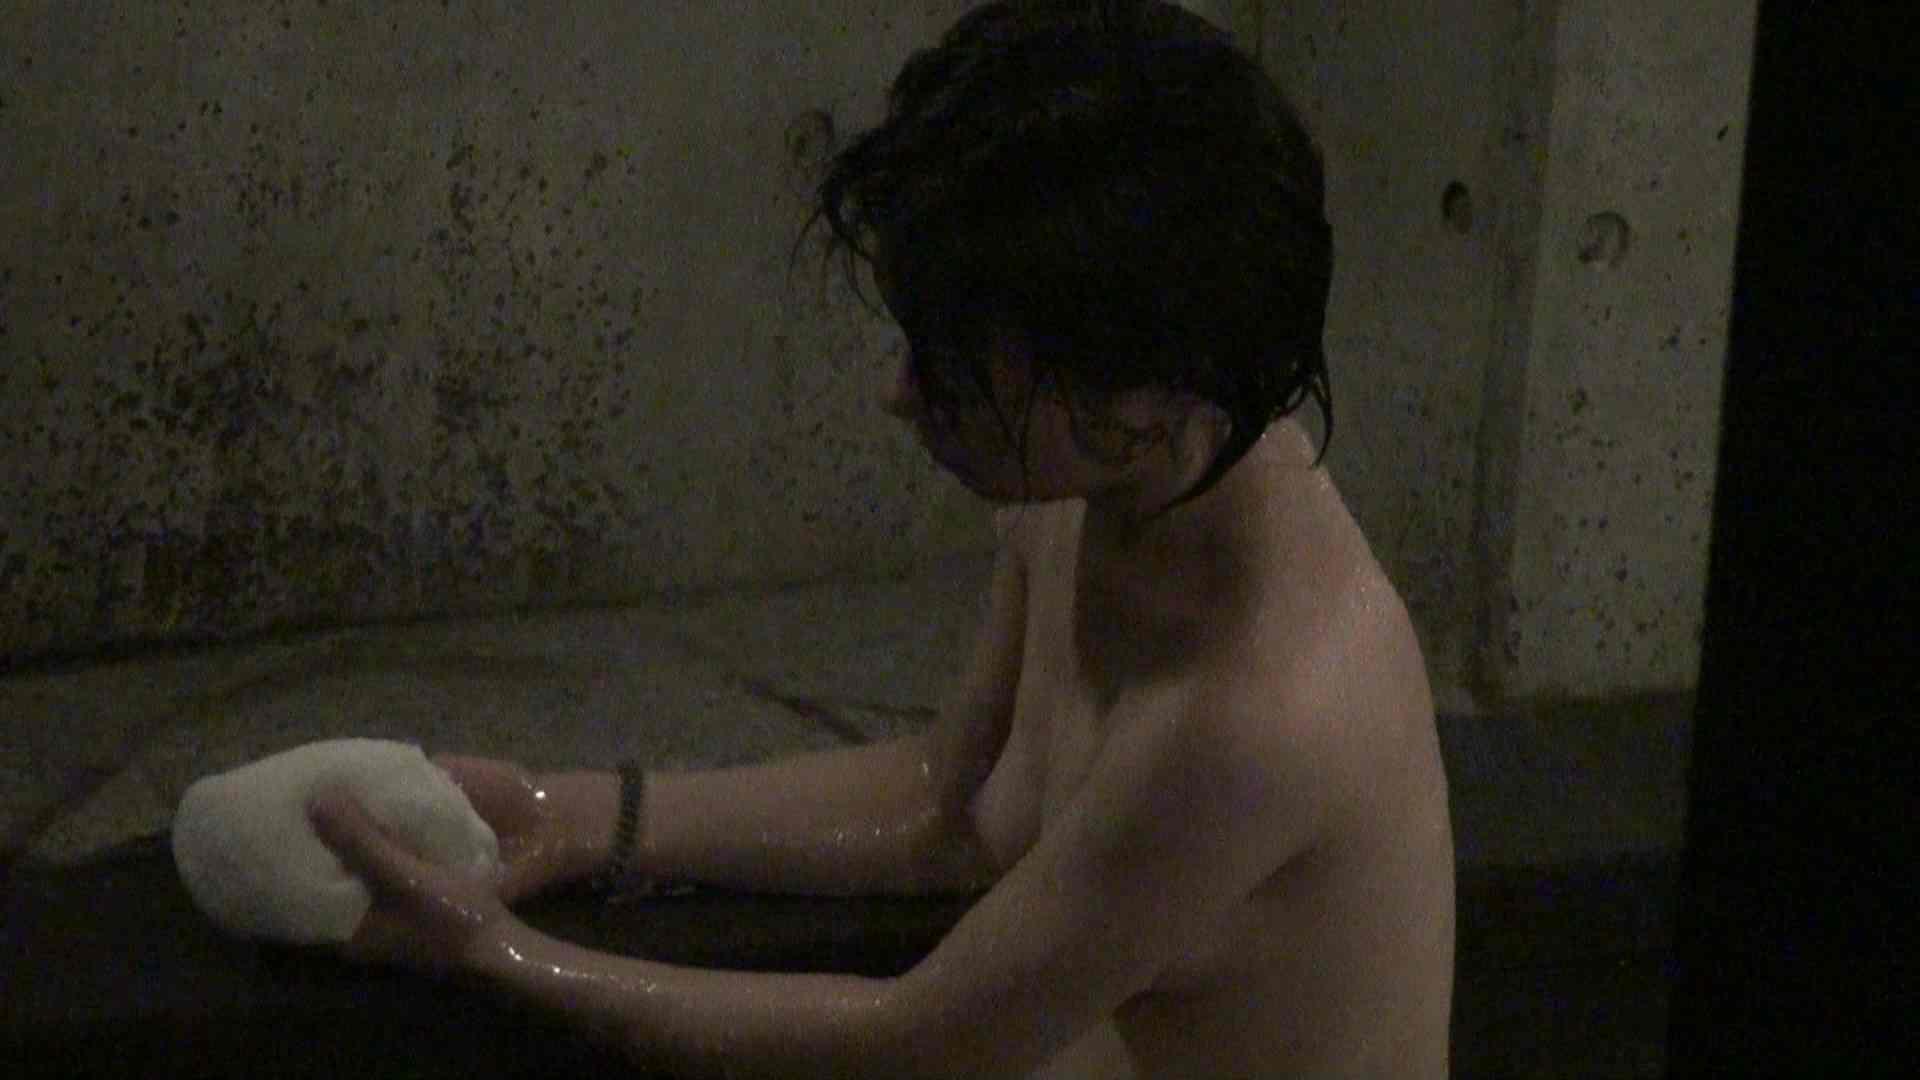 Aquaな露天風呂Vol.352 盗撮大放出 濡れ場動画紹介 75連発 14